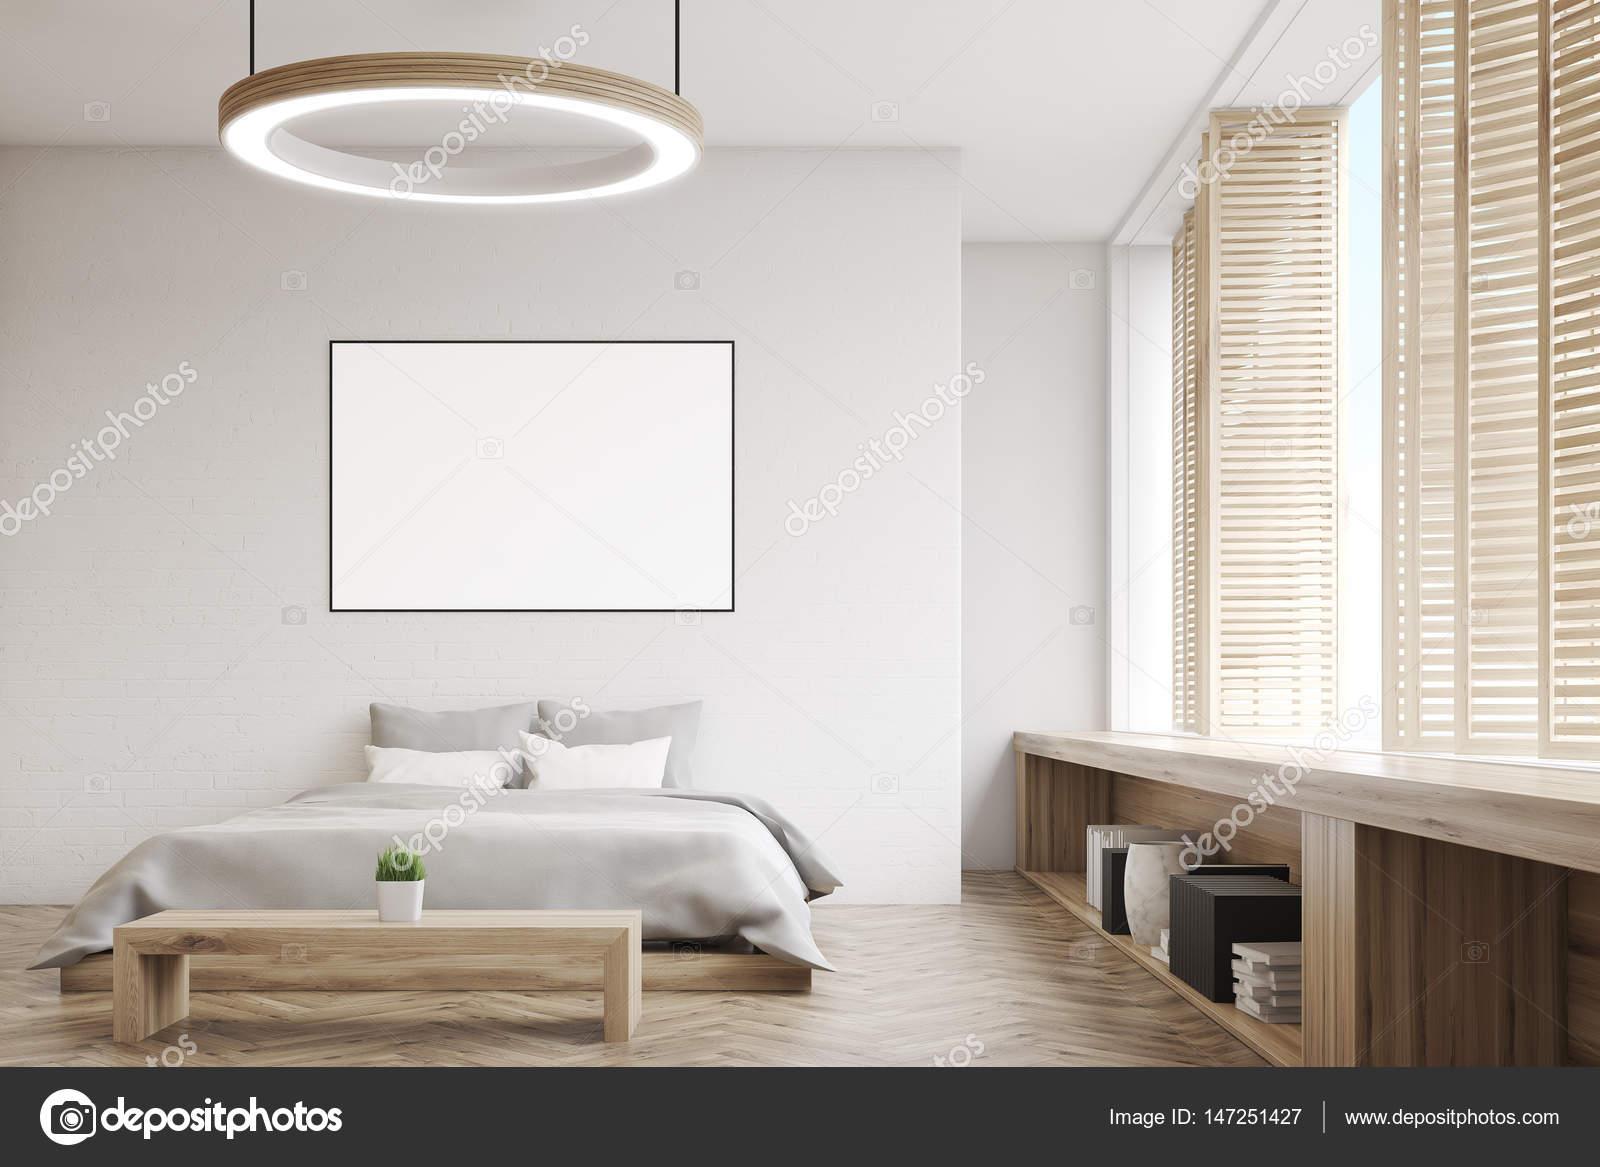 https://st3.depositphotos.com/2673929/14725/i/1600/depositphotos_147251427-stockafbeelding-slaapkamer-met-ronde-lamp.jpg